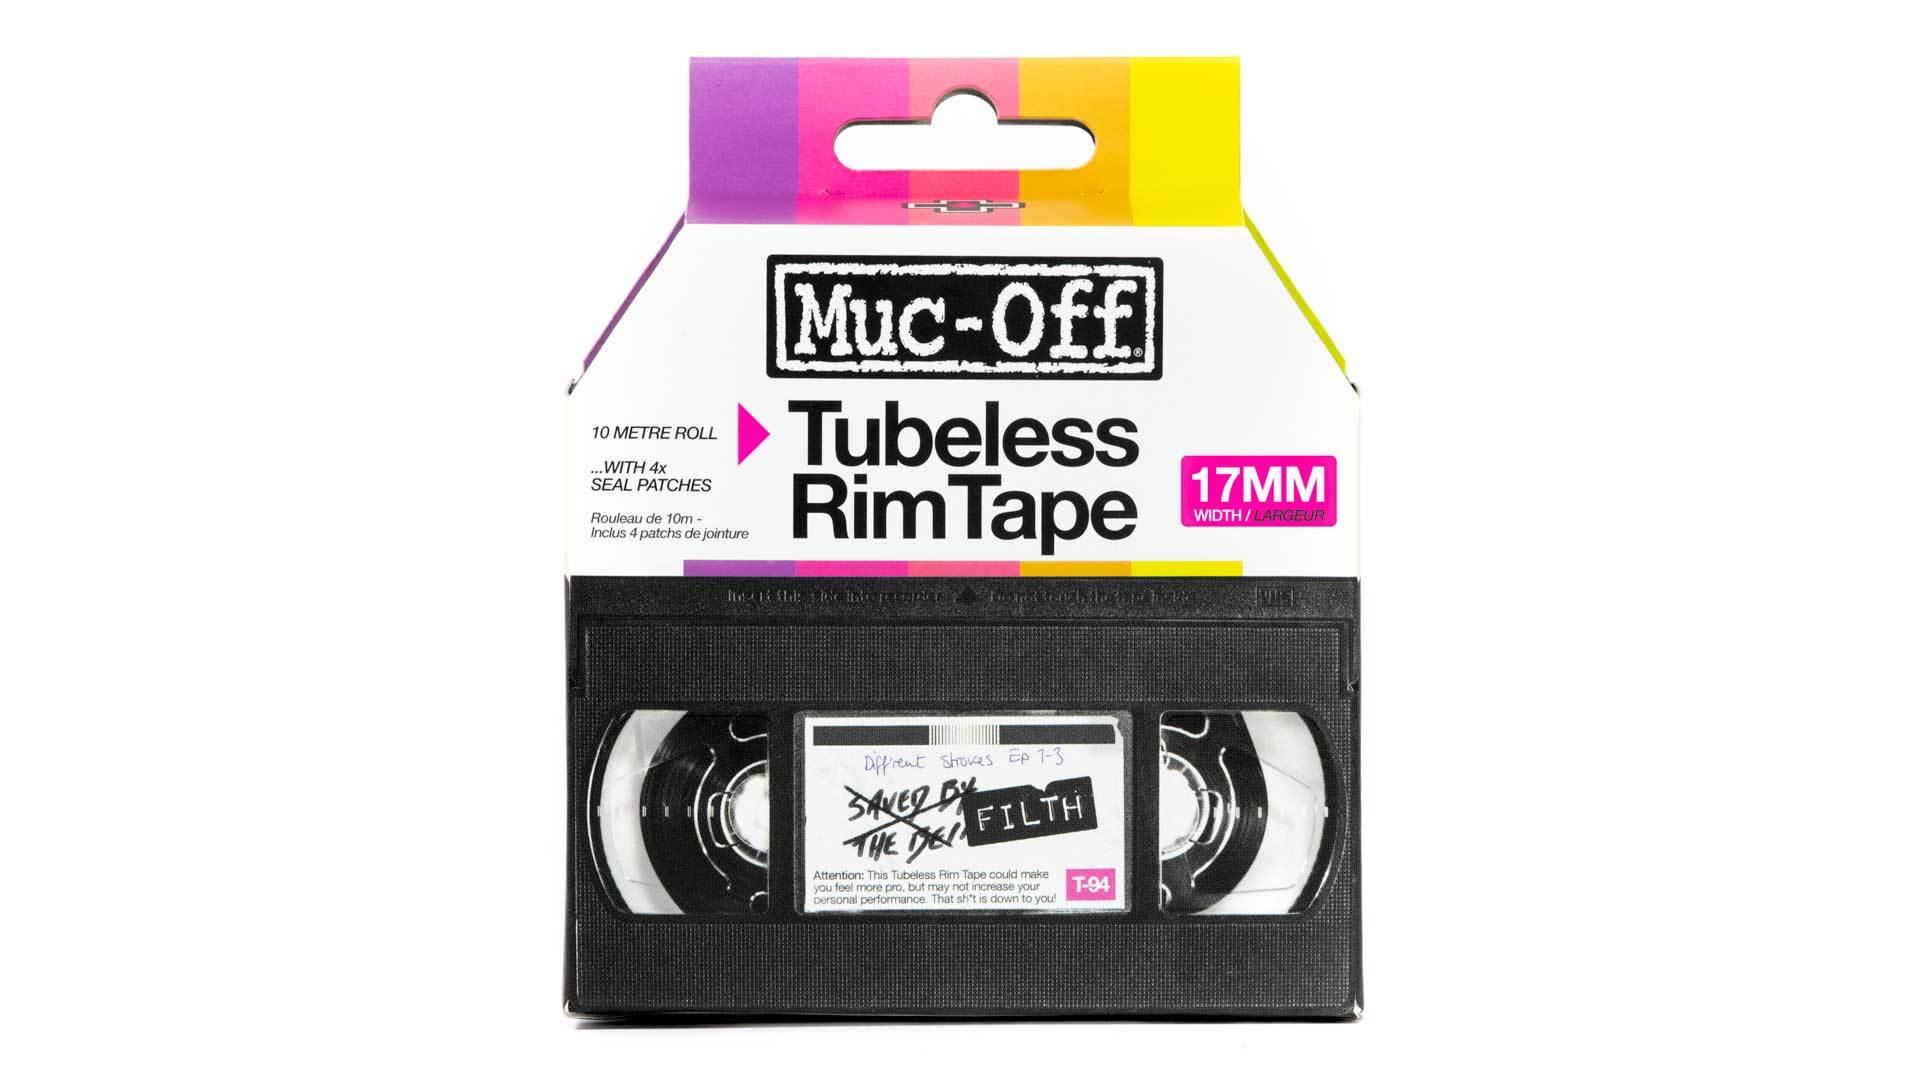 Muc-Off Fälgband, Tubeless RimTape 10m, Diverse Breddalternativ